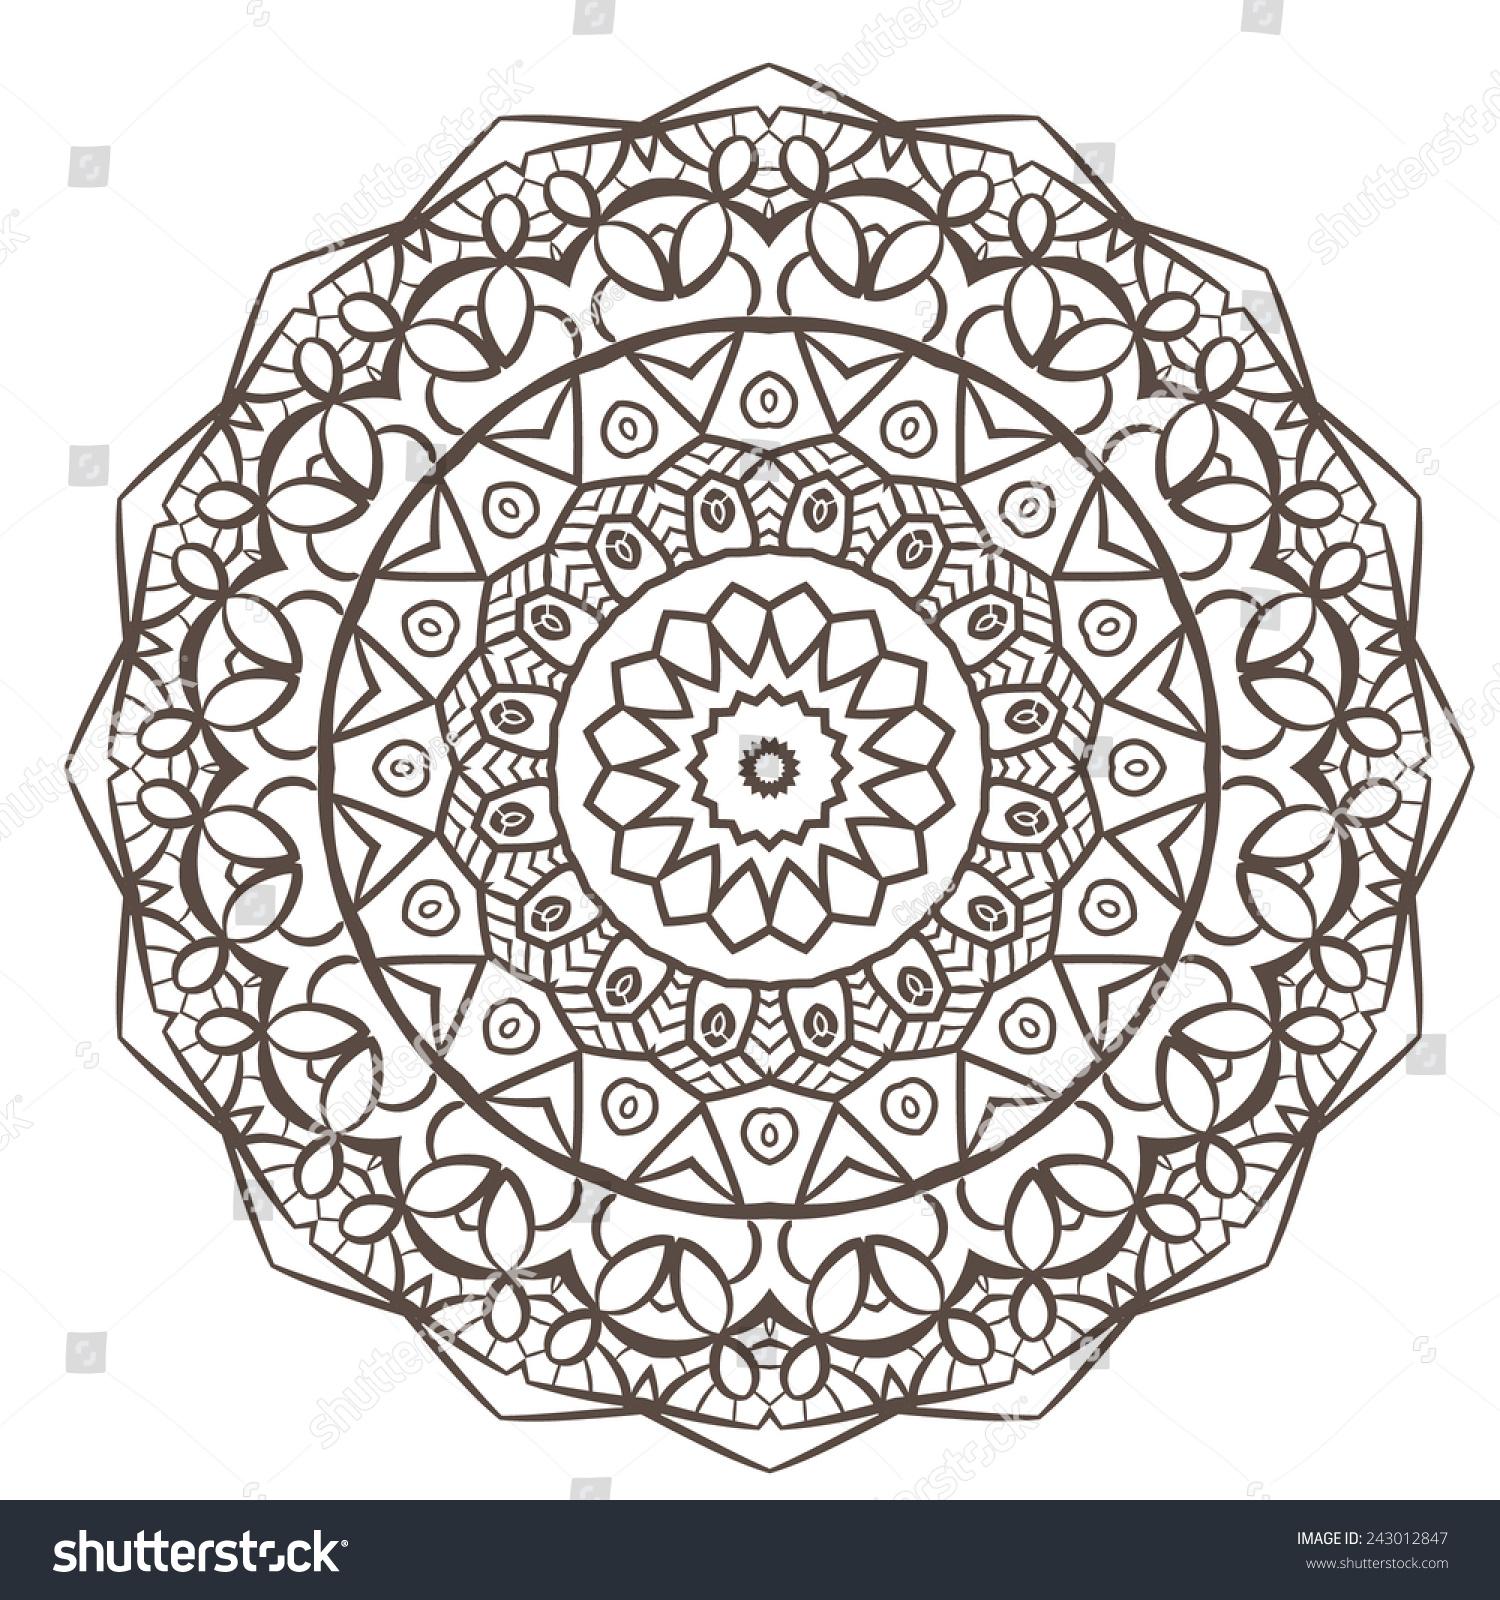 Ethnic Fractal Mandala Vector Meditation Looks Stock Vector ...